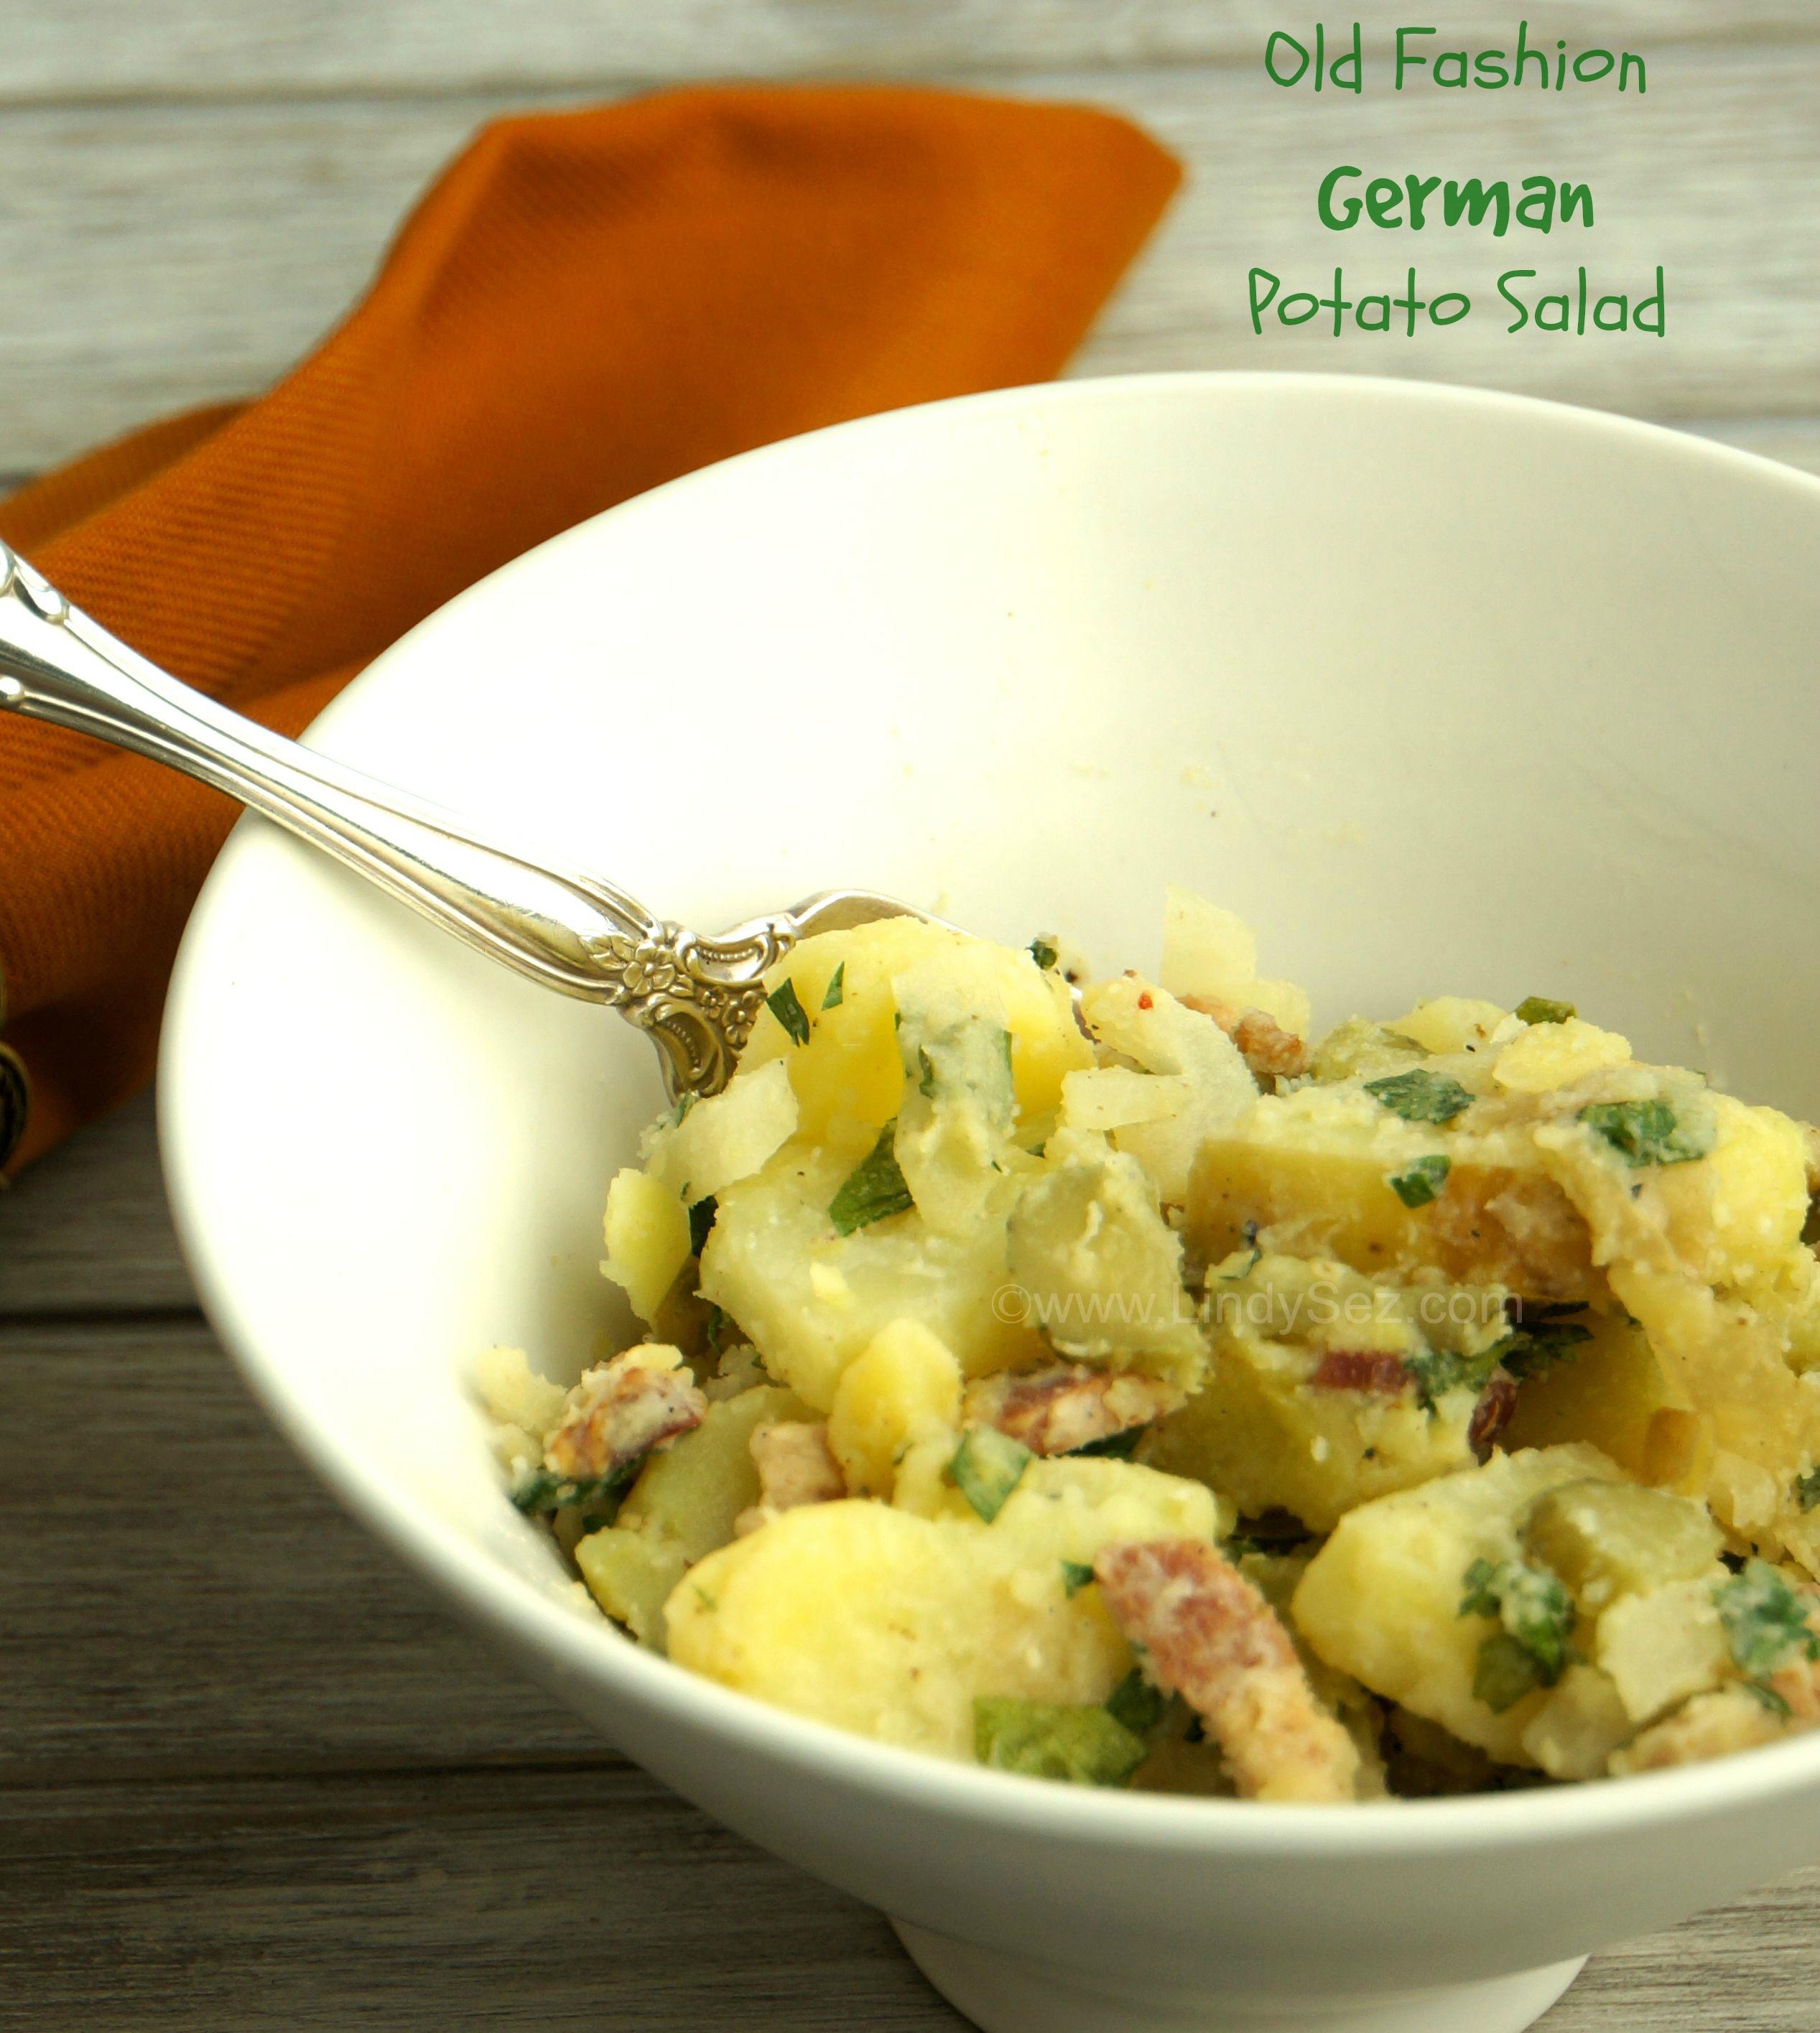 Best old fashioned potato salad recipe 33